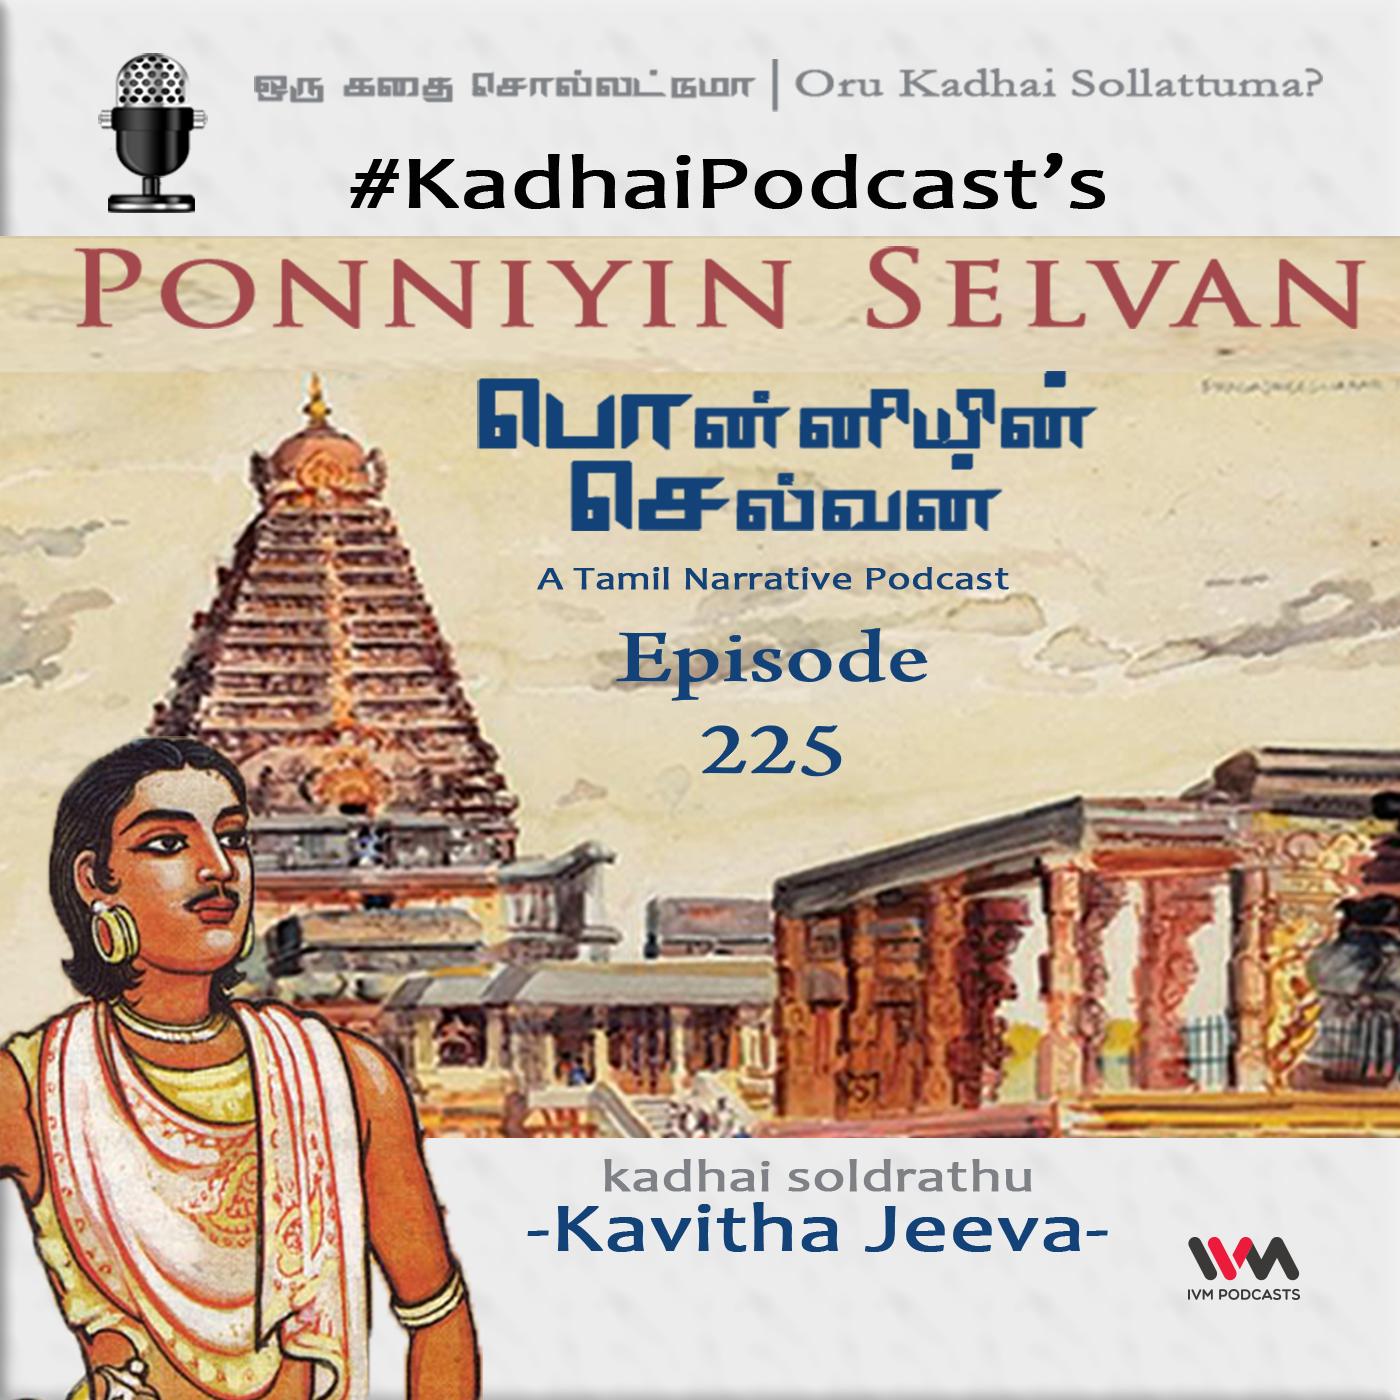 KadhaiPodcast's Ponniyin Selvan - Episode # 225